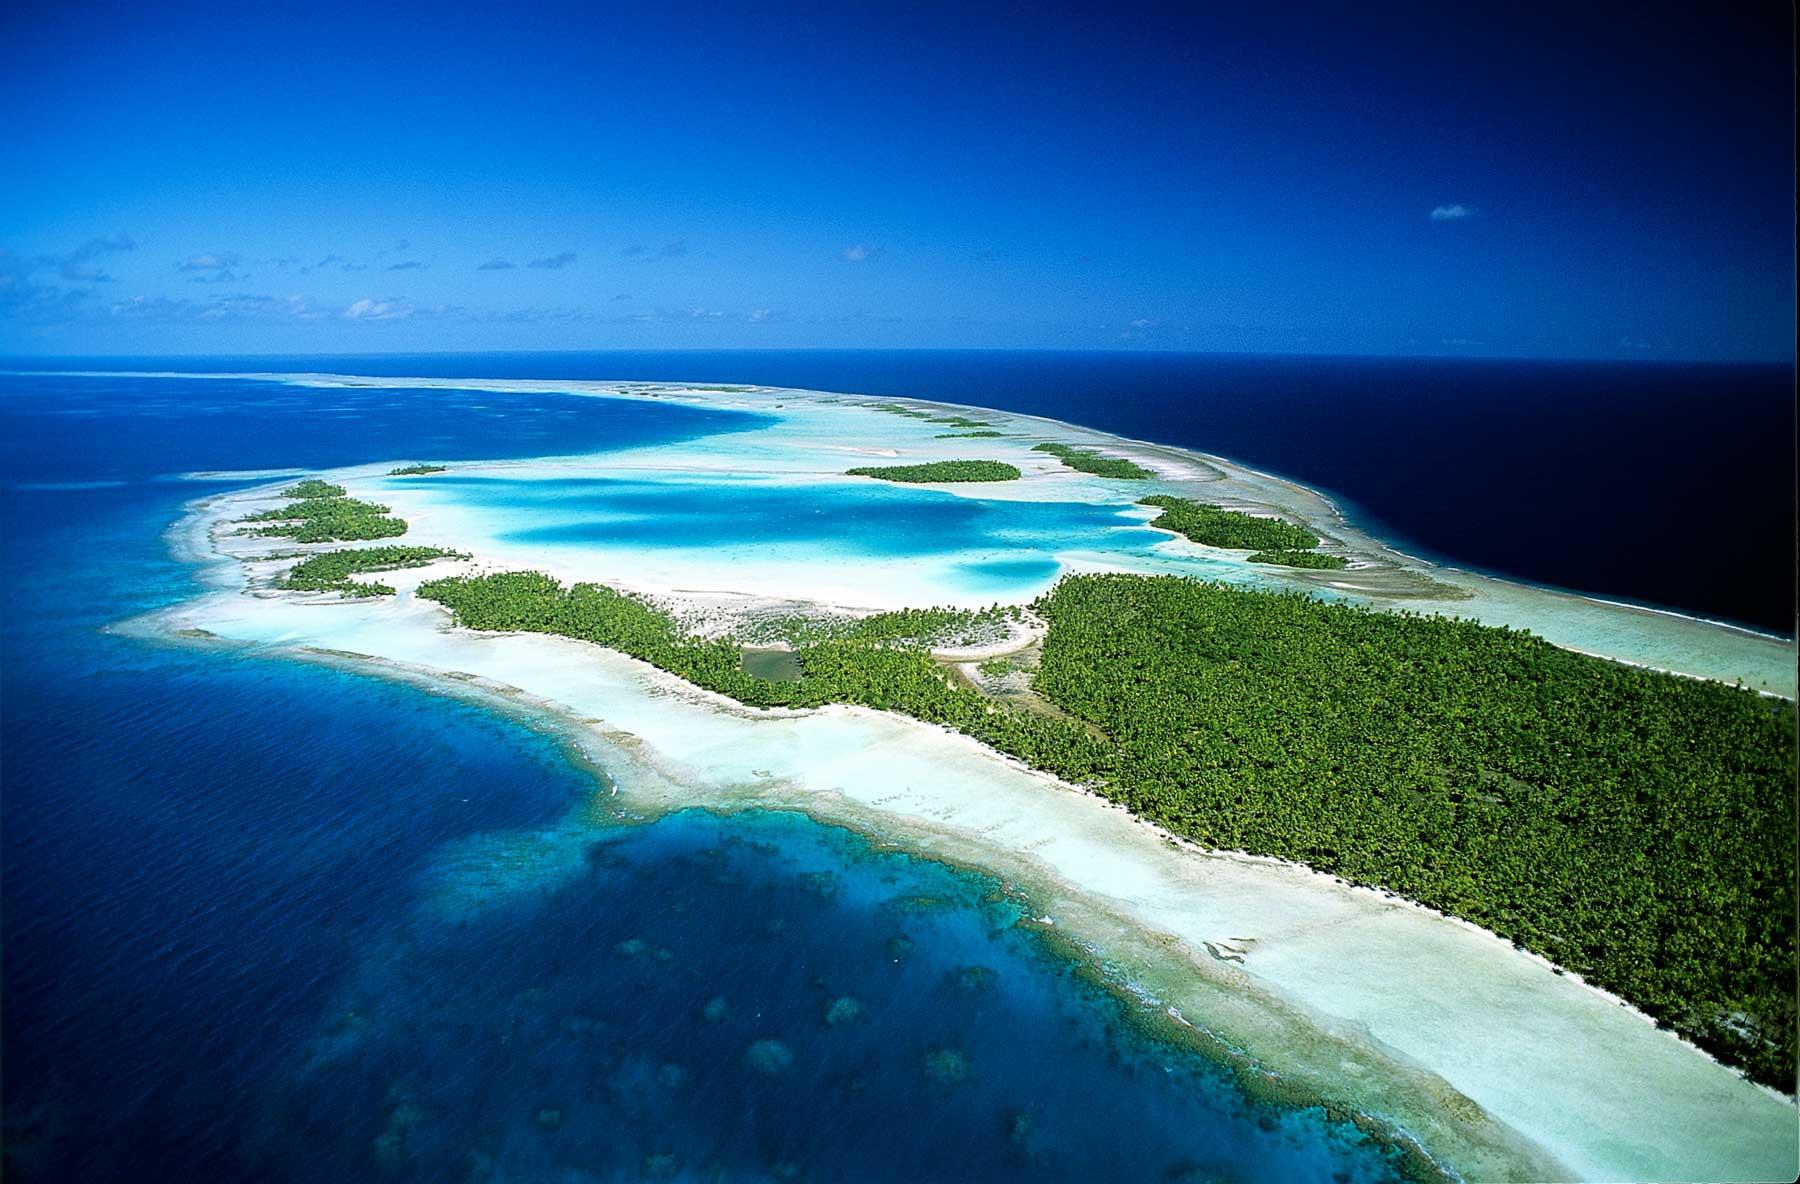 Rangiroa, Tuamotu Islands, French Polynesia  № 6962 загрузить